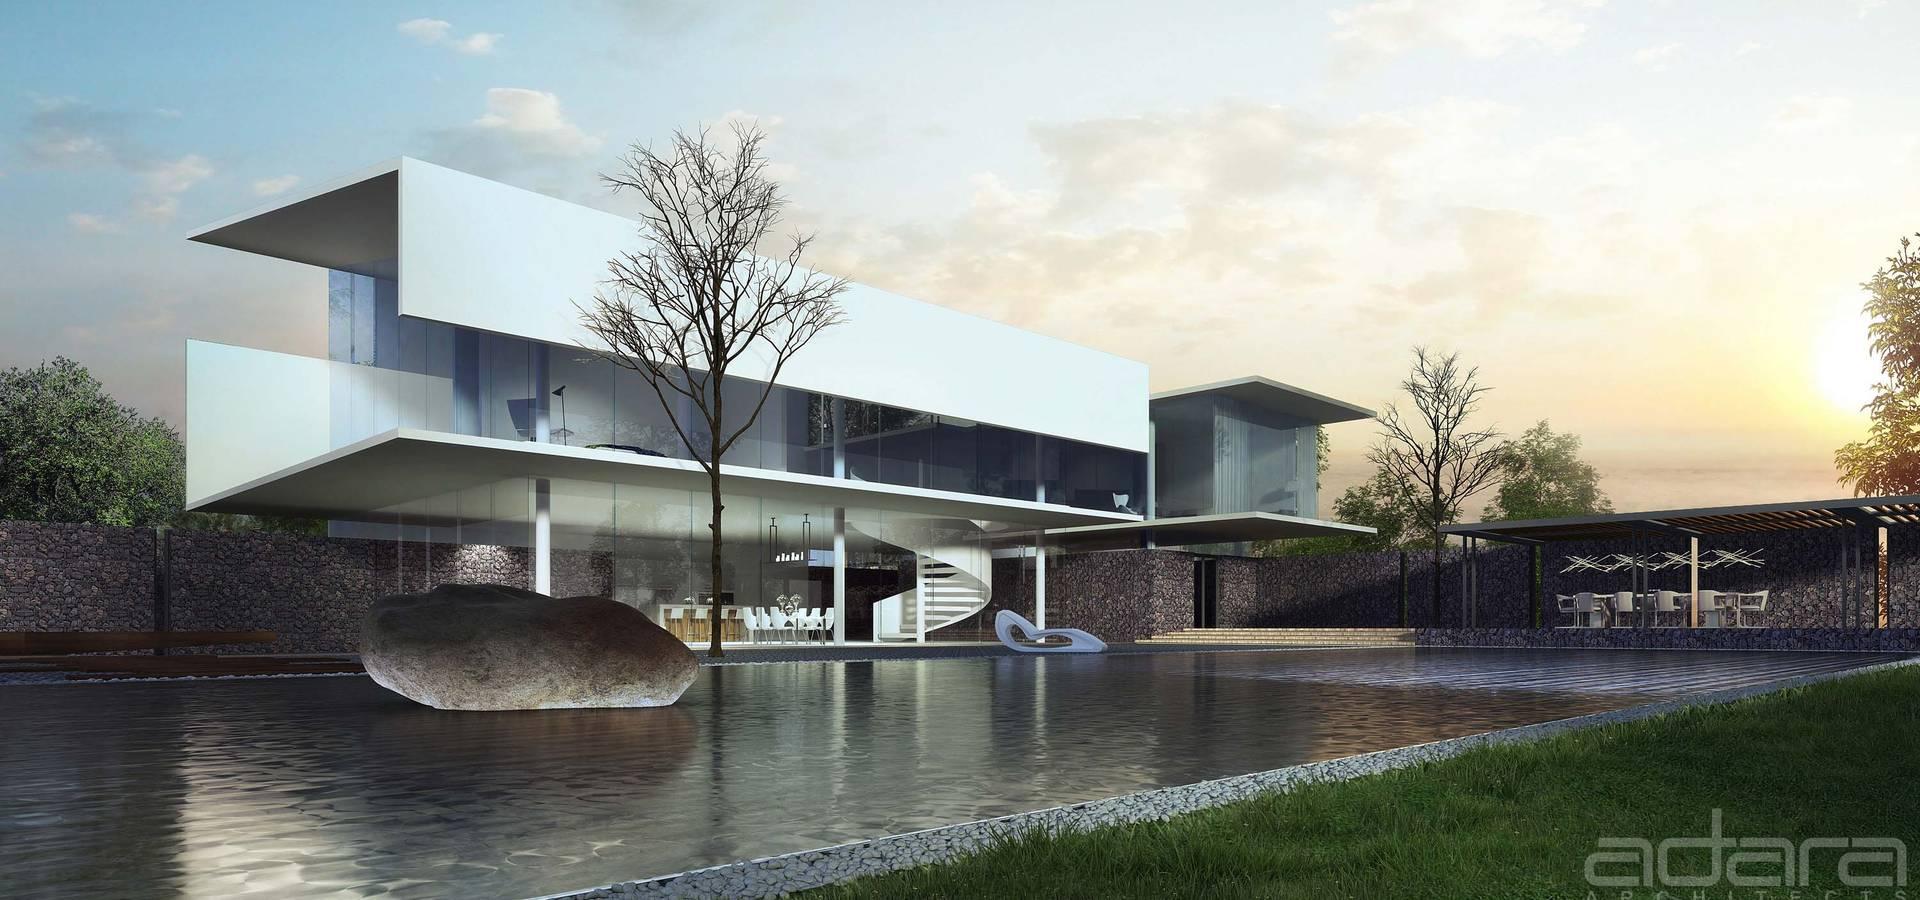 Adara Architects